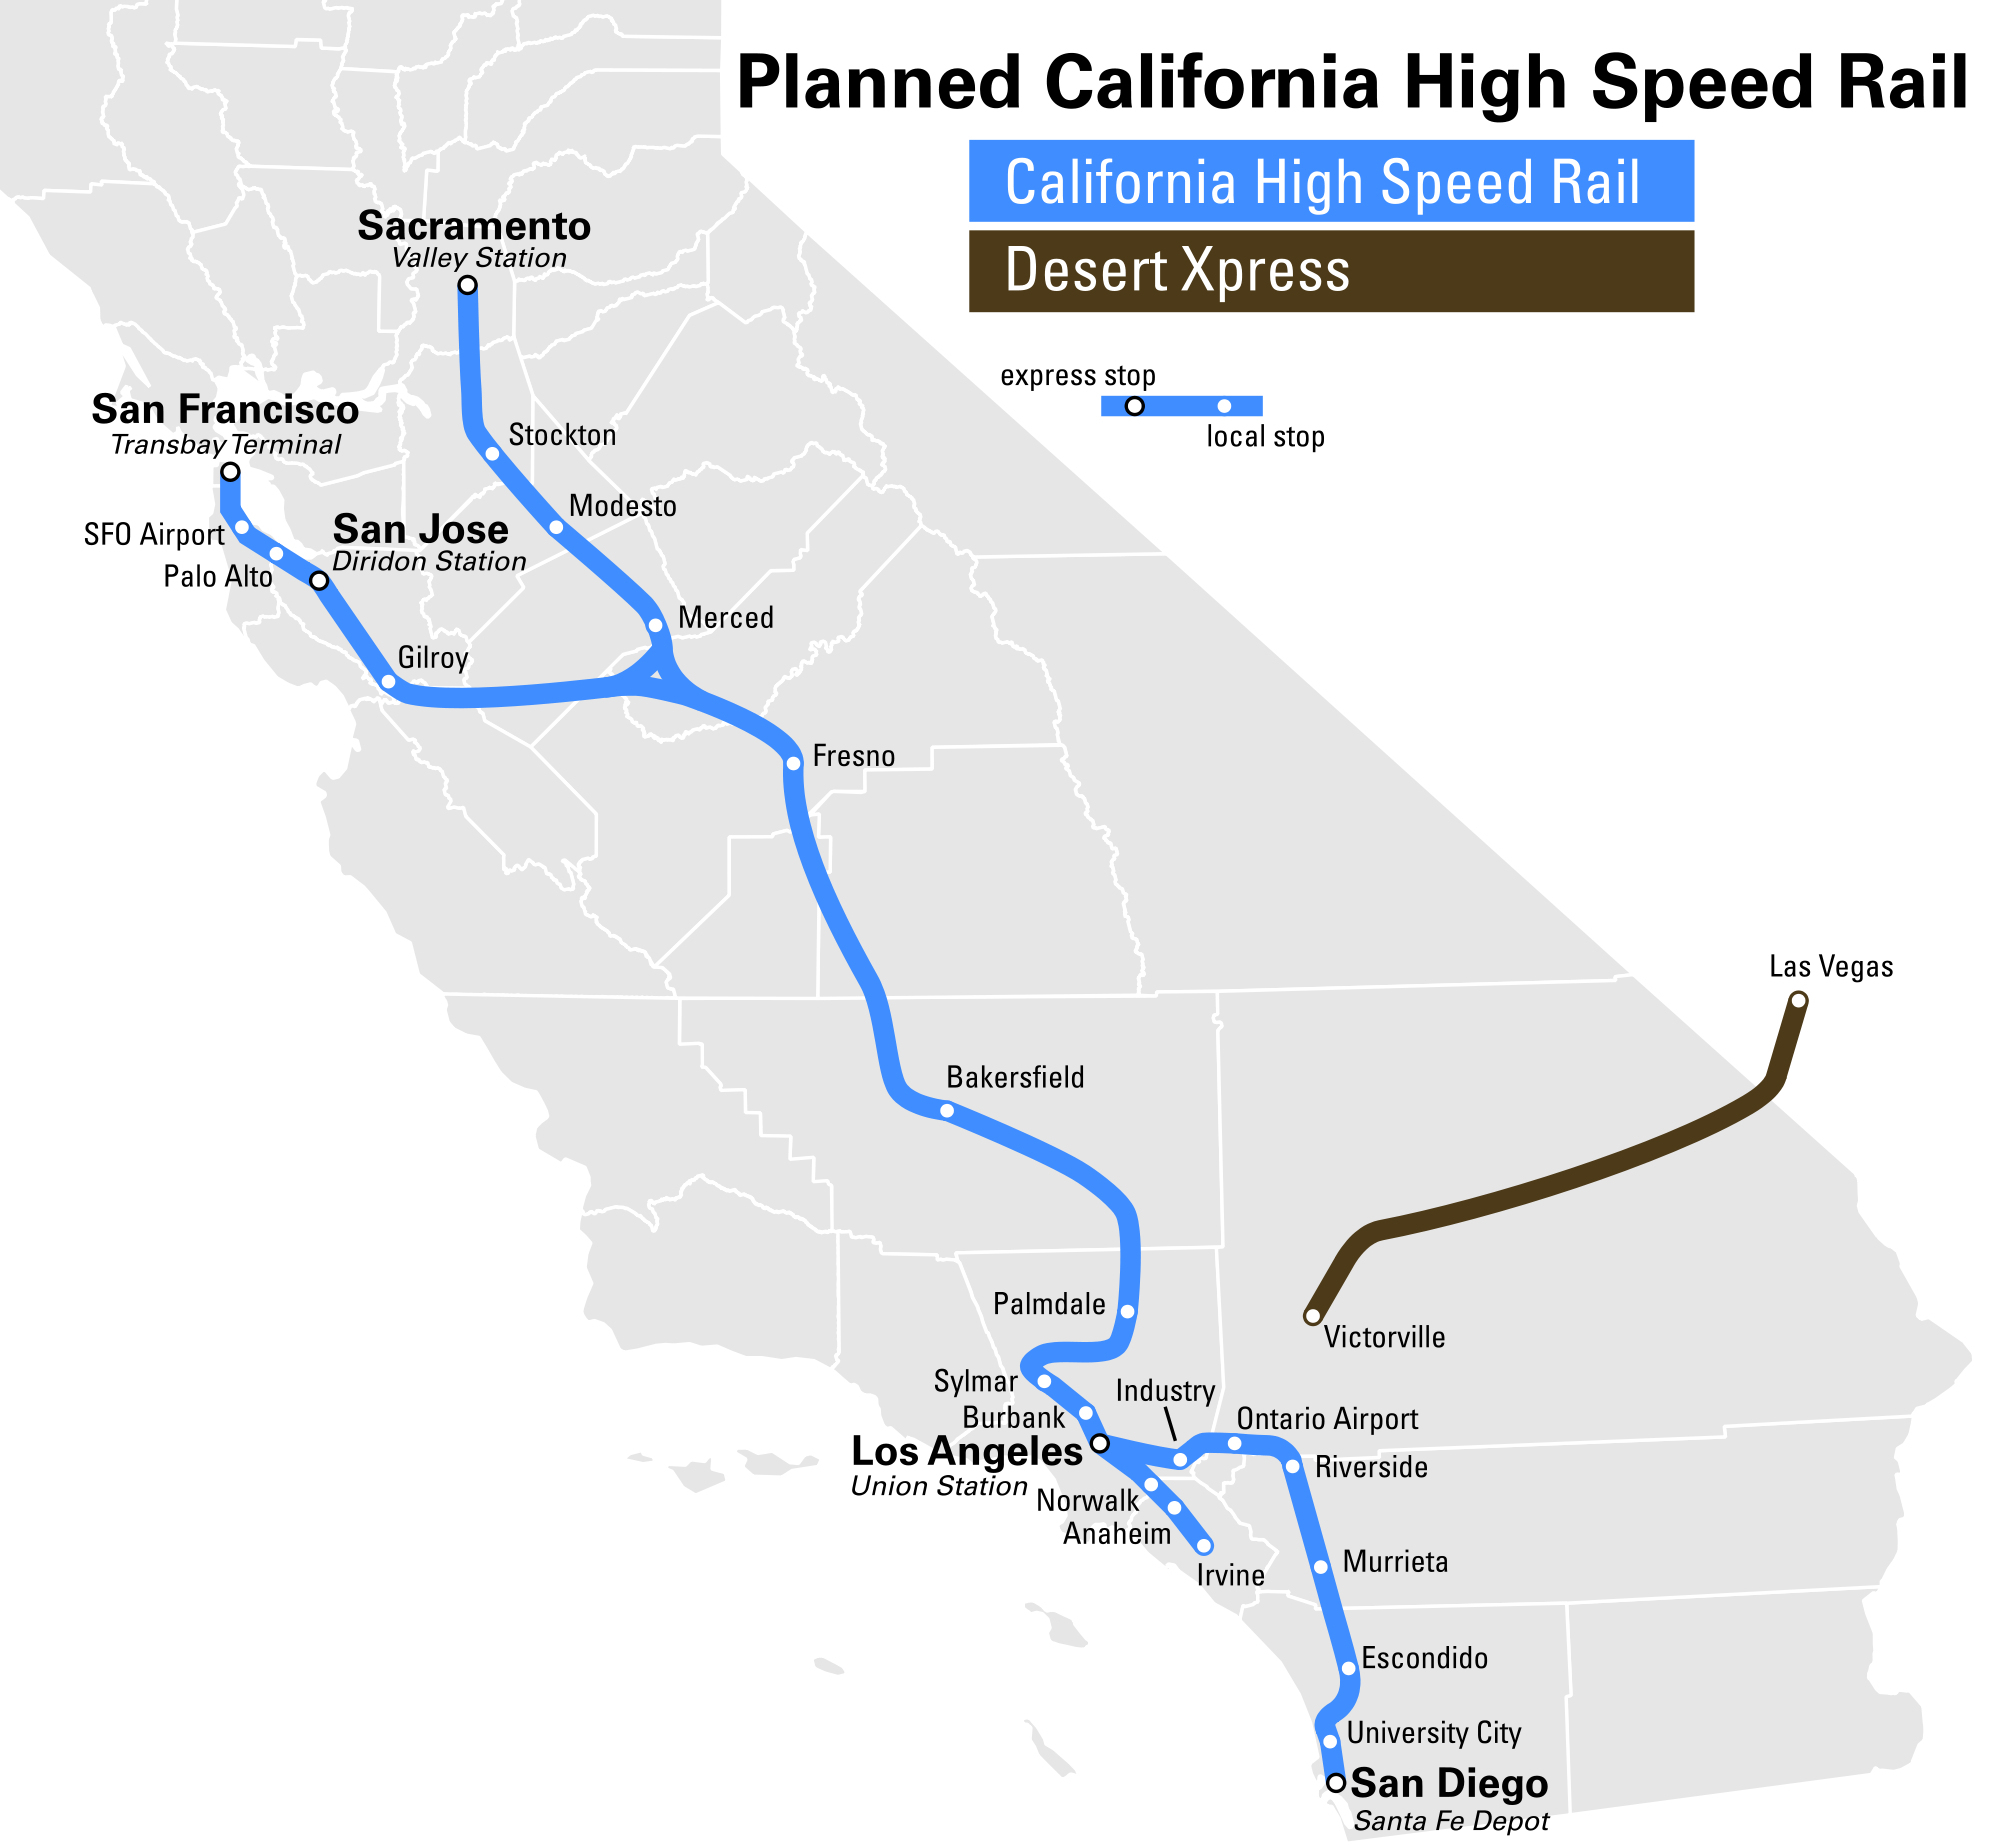 Xpresswest High Speed Rail California State Map High Speed Rail Map - High Speed Rail California Map